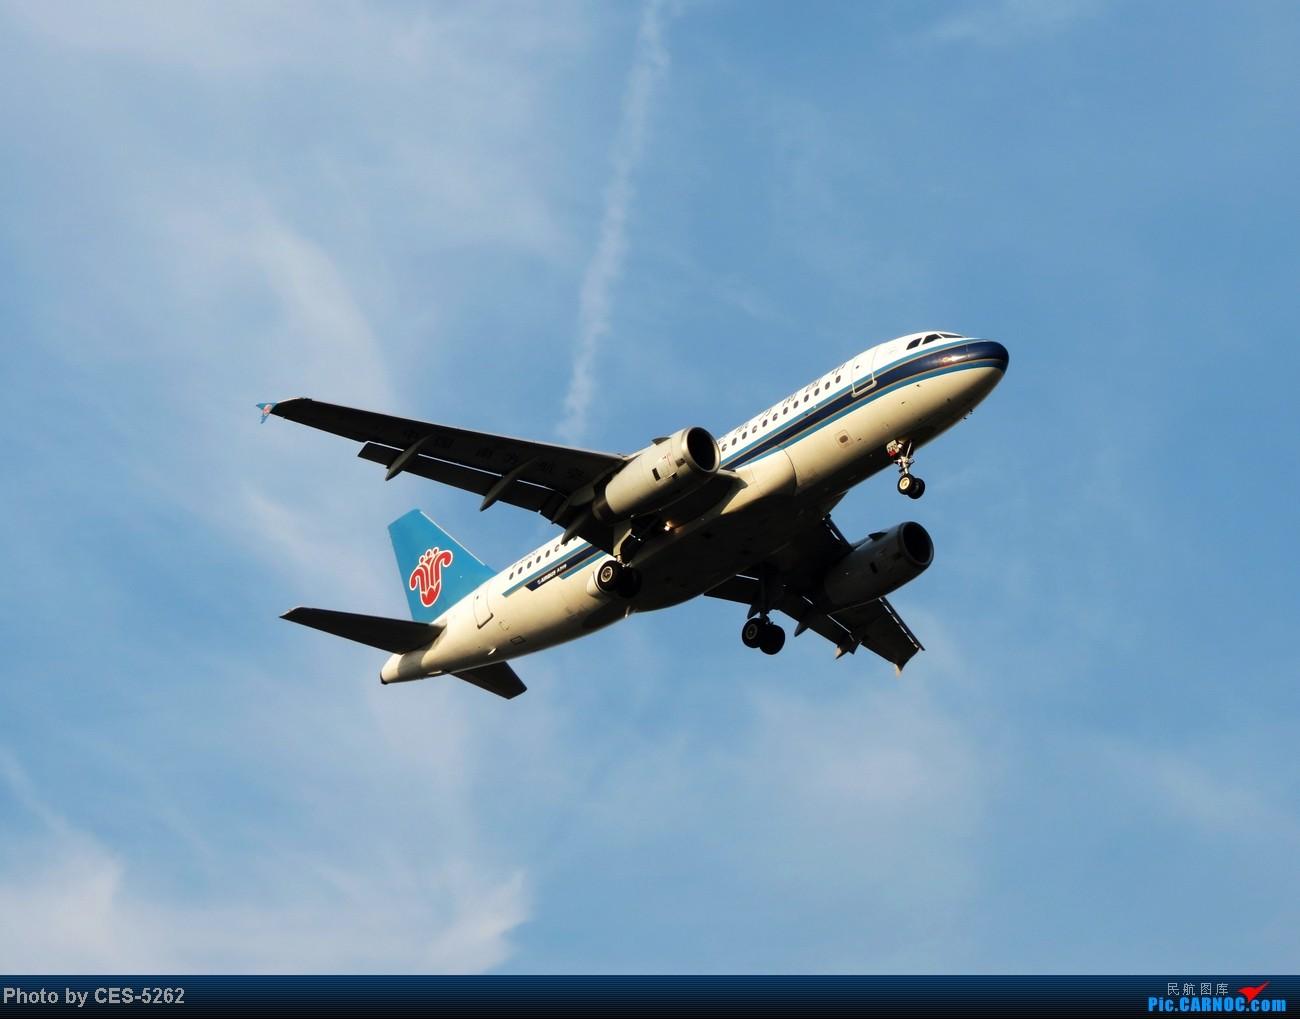 Re:[原创]国庆TAO很热闹哈,临沂飞友流窜TAO记 AIRBUS A319-100 B-6220 中国青岛流亭机场